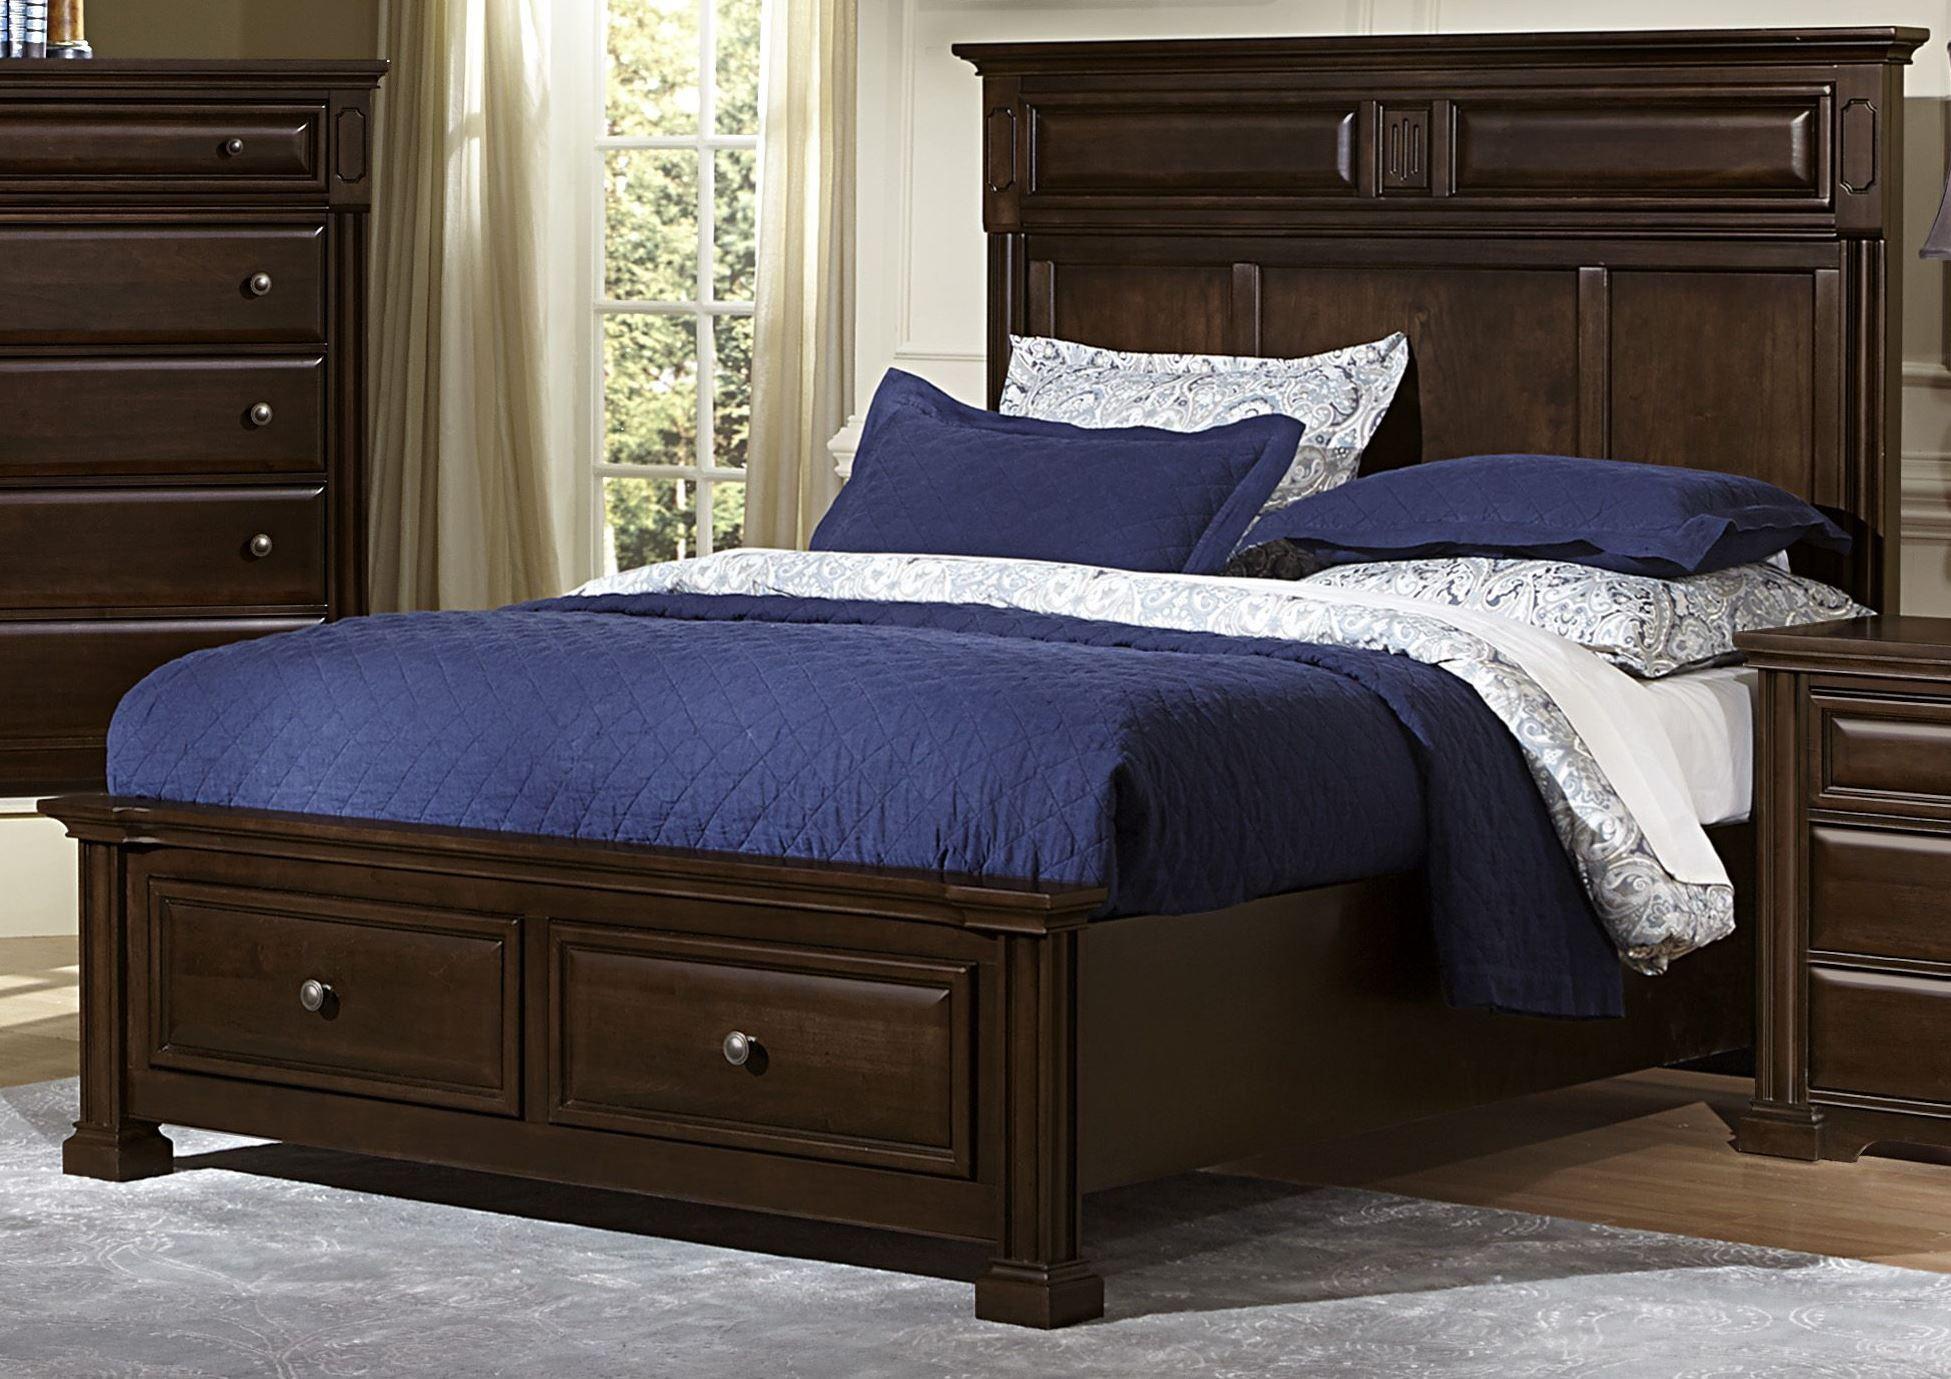 Knightsbridge Dark Cherry Mansion Storage Bedroom Set From Vaughan Bassett Coleman Furniture